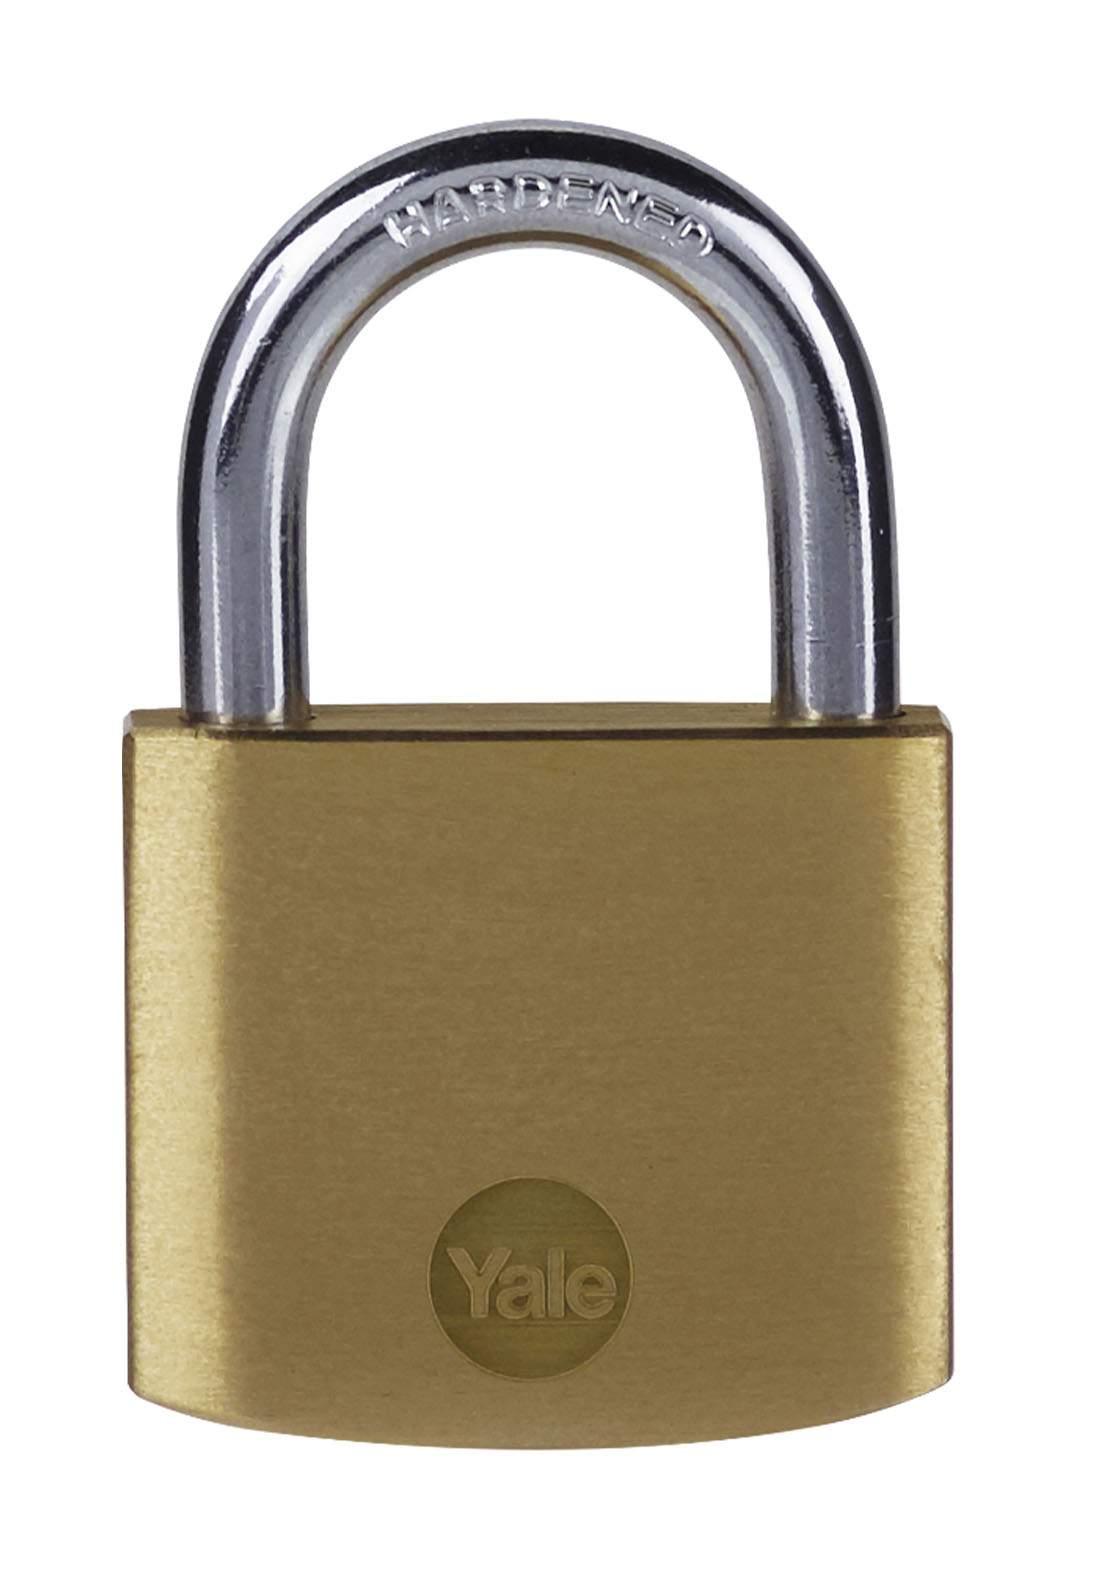 Yale Y110B/40/122/1 Padlock Brass 40 mm قفل للاغراض العامة